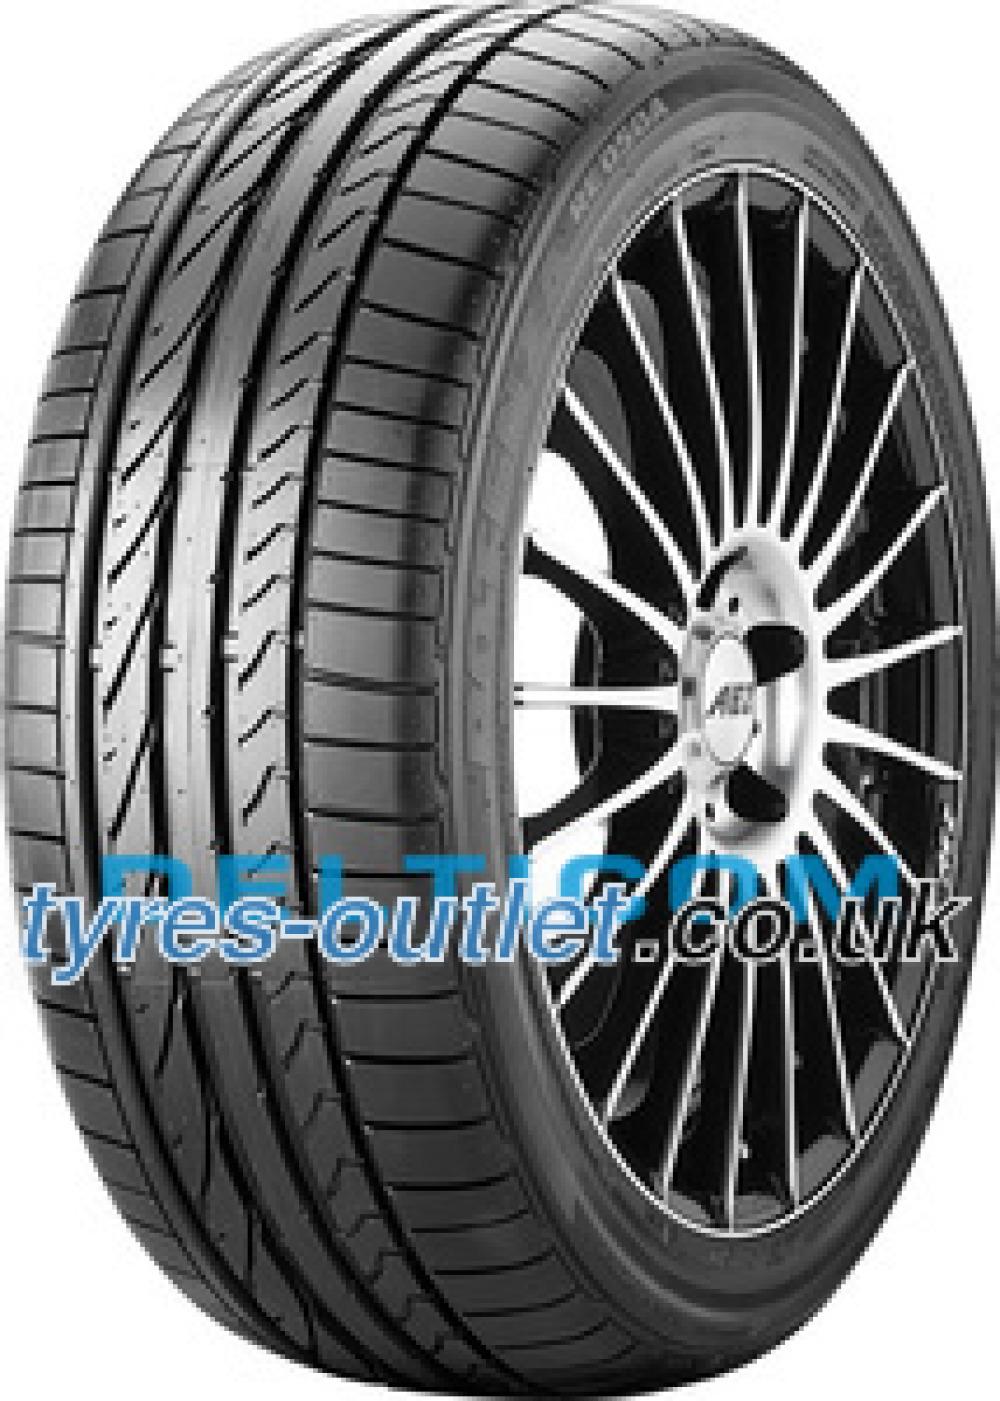 Bridgestone Potenza RE 050 A EXT ( 285/35 R18 97Y MOE, runflat, with rim protection (MFS) )